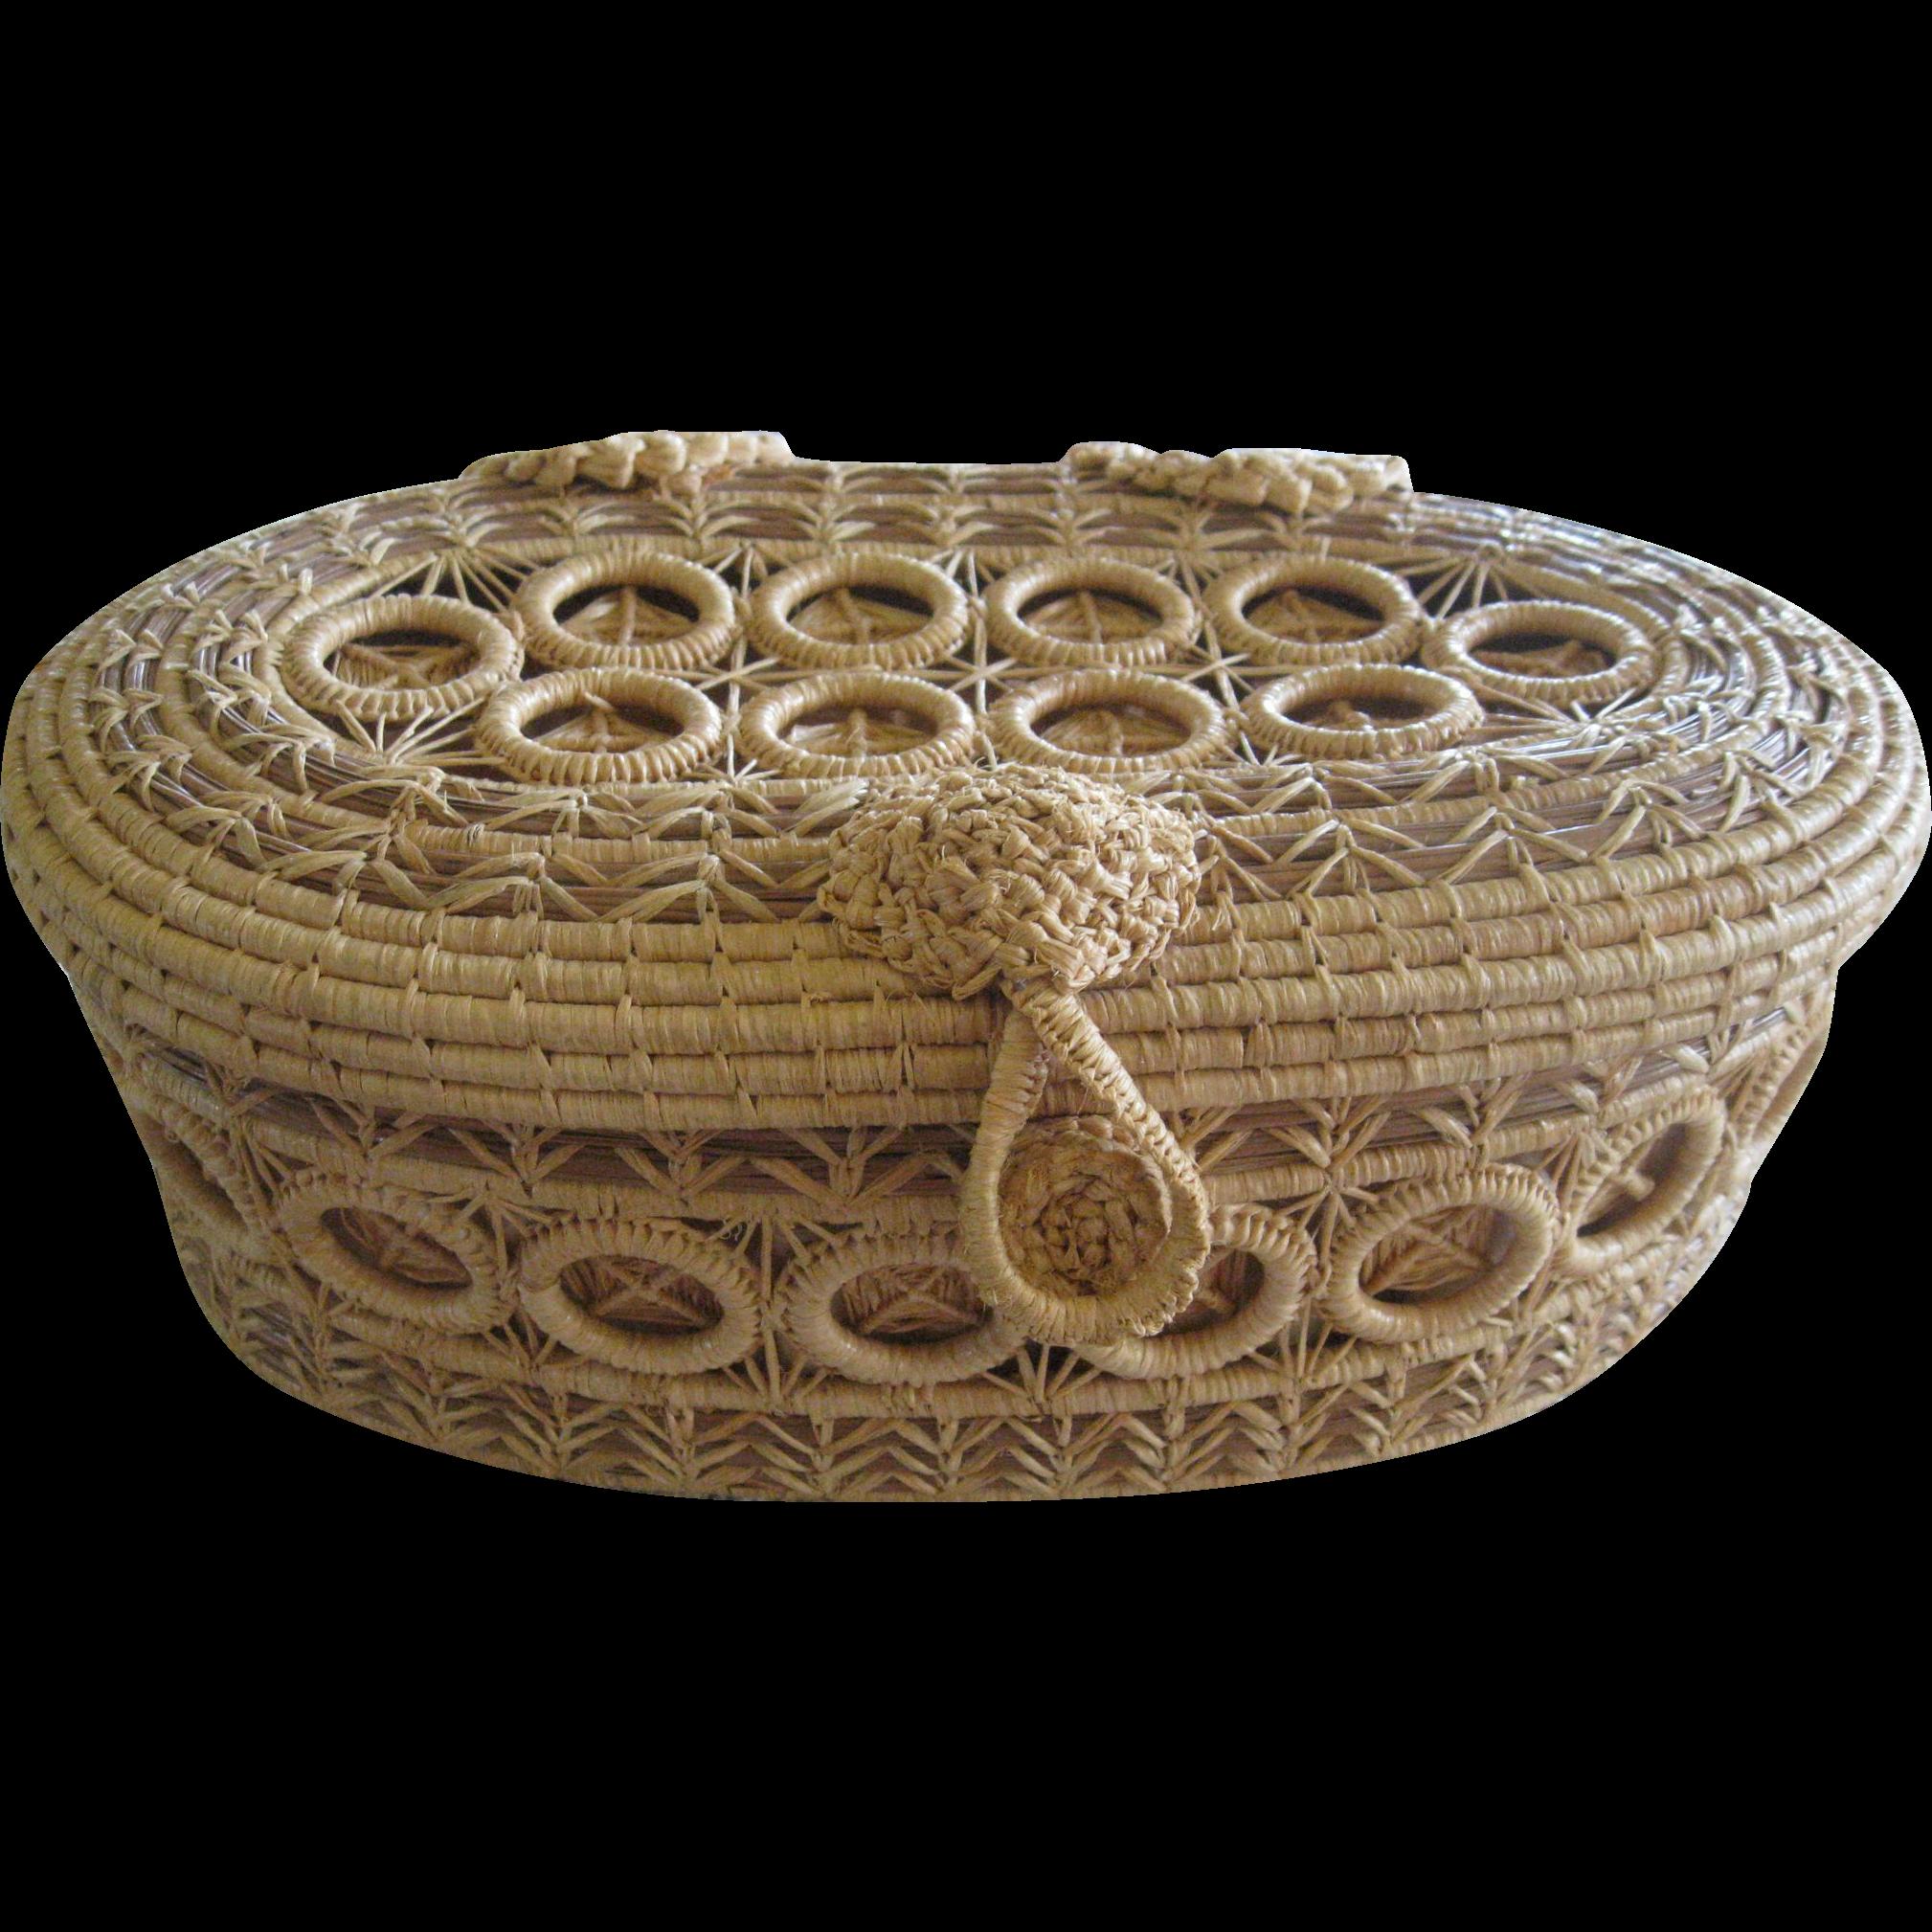 Handmade American Baskets : Native american basket hand made grass pink